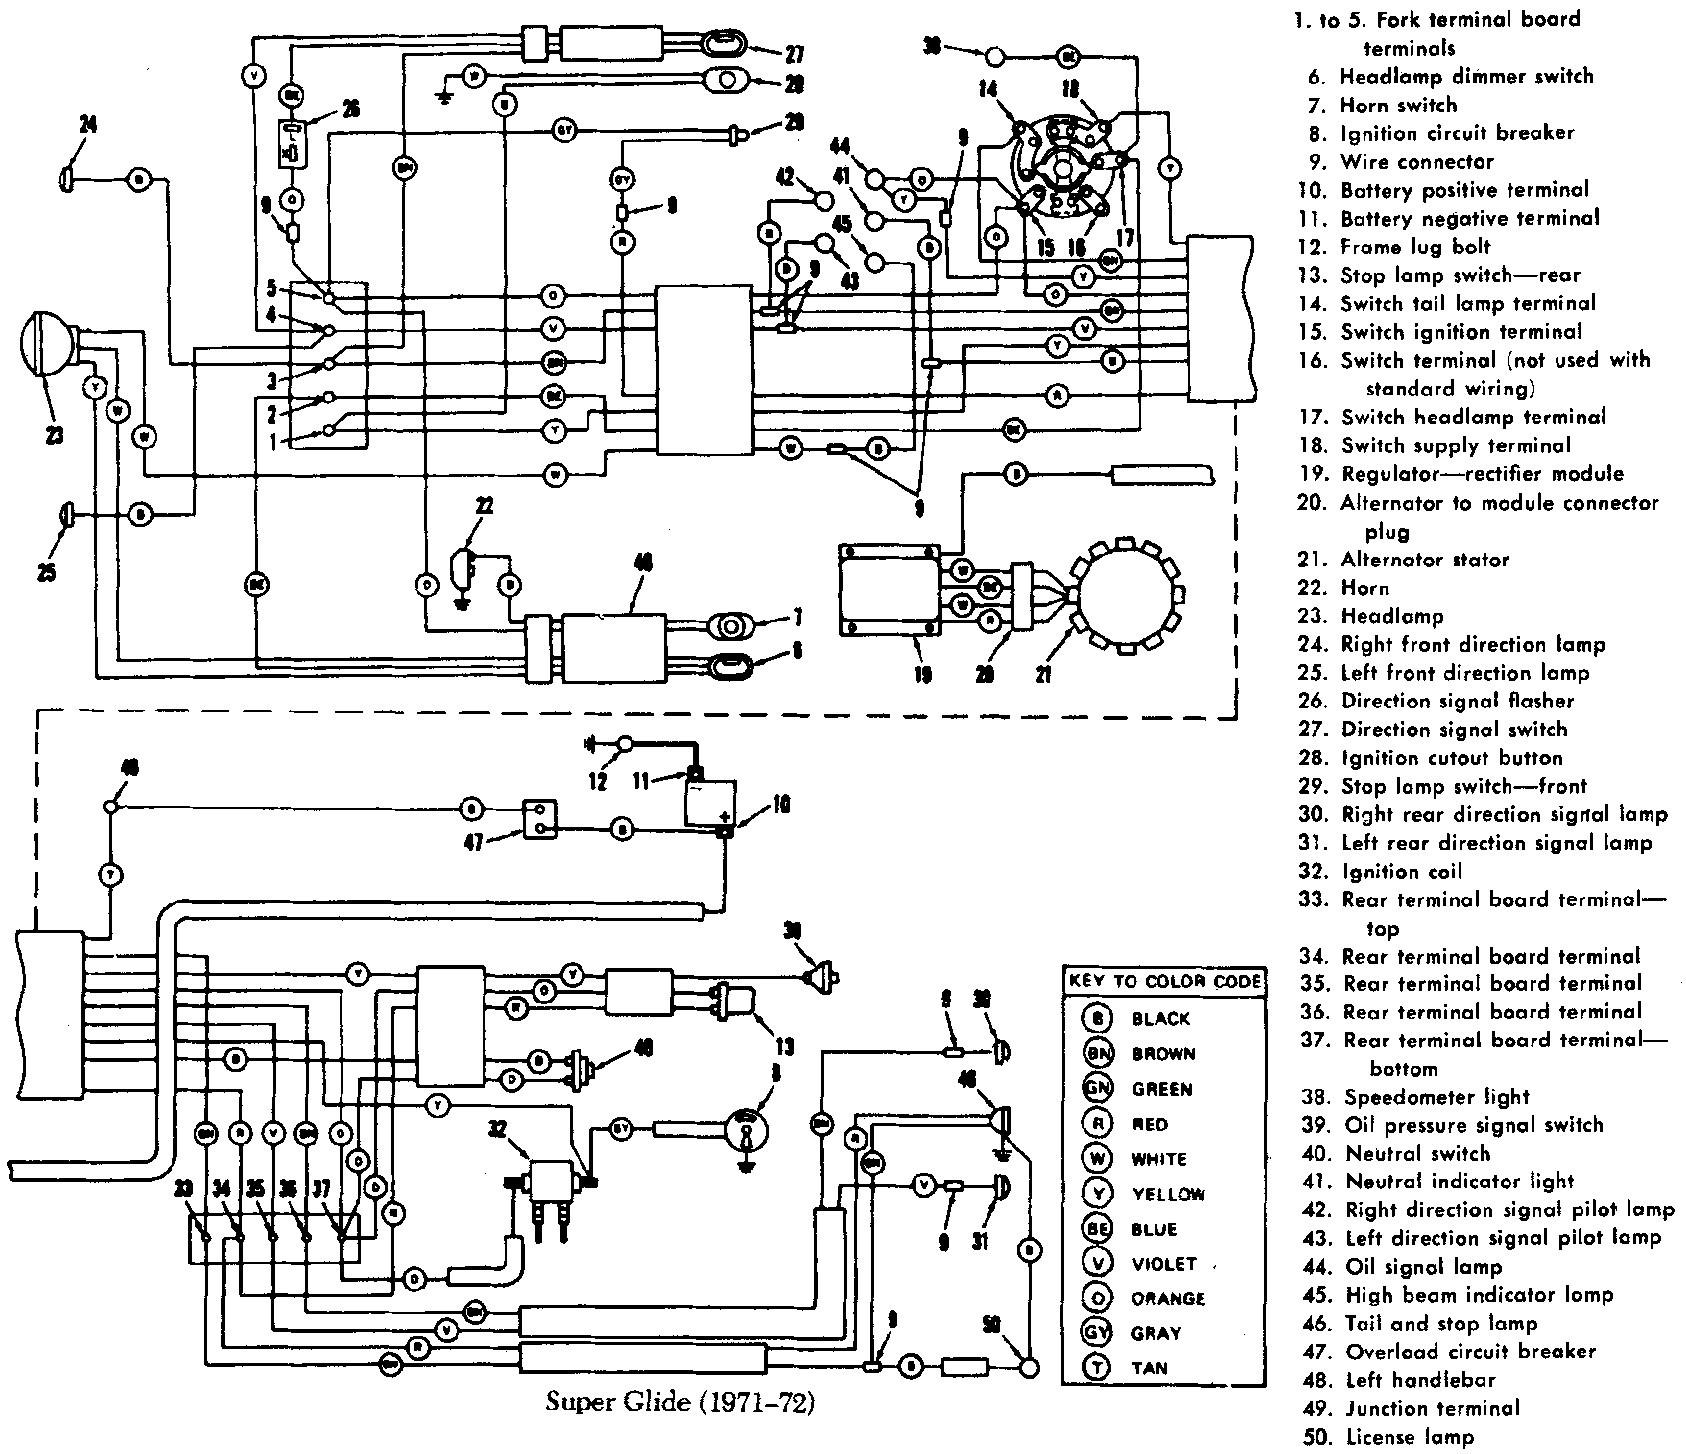 1974 Harley Golf Cart Wiring Diagram | Wiring Diagram on